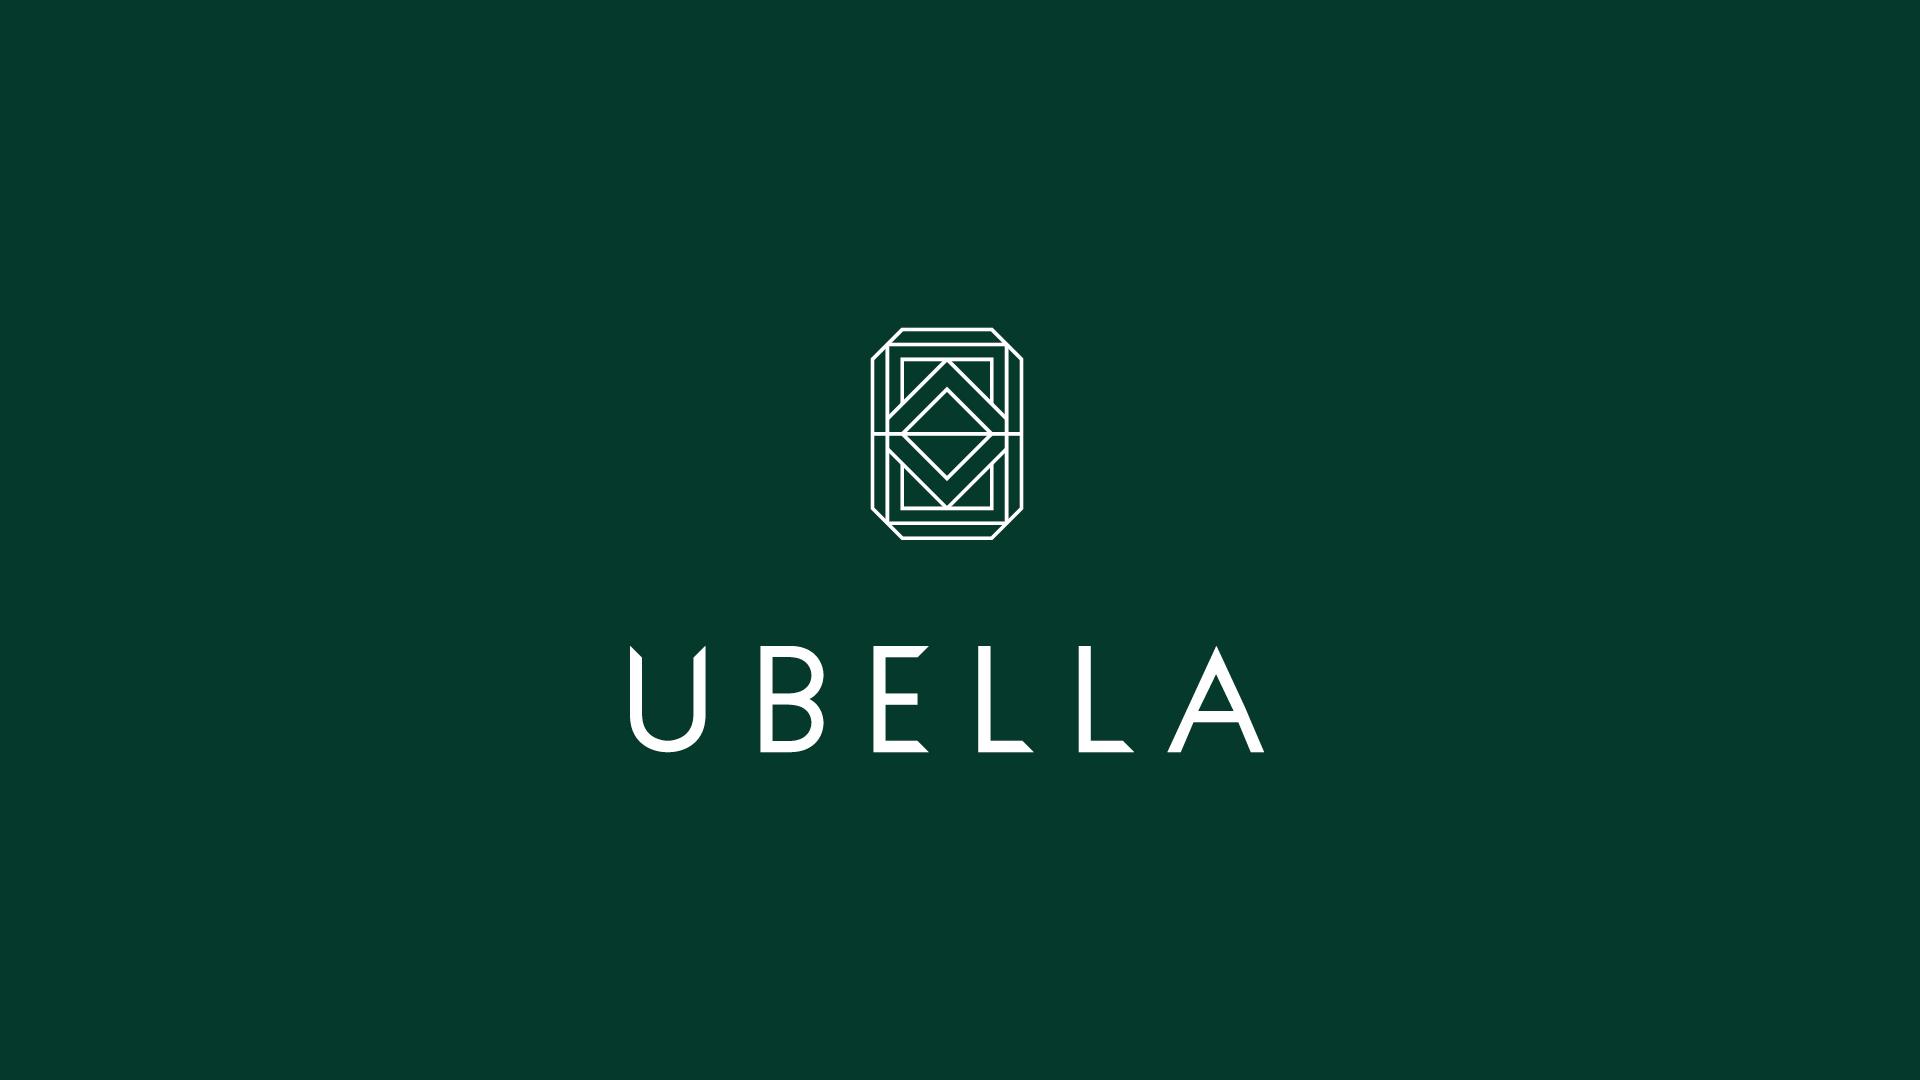 07_Ubella_Body_1